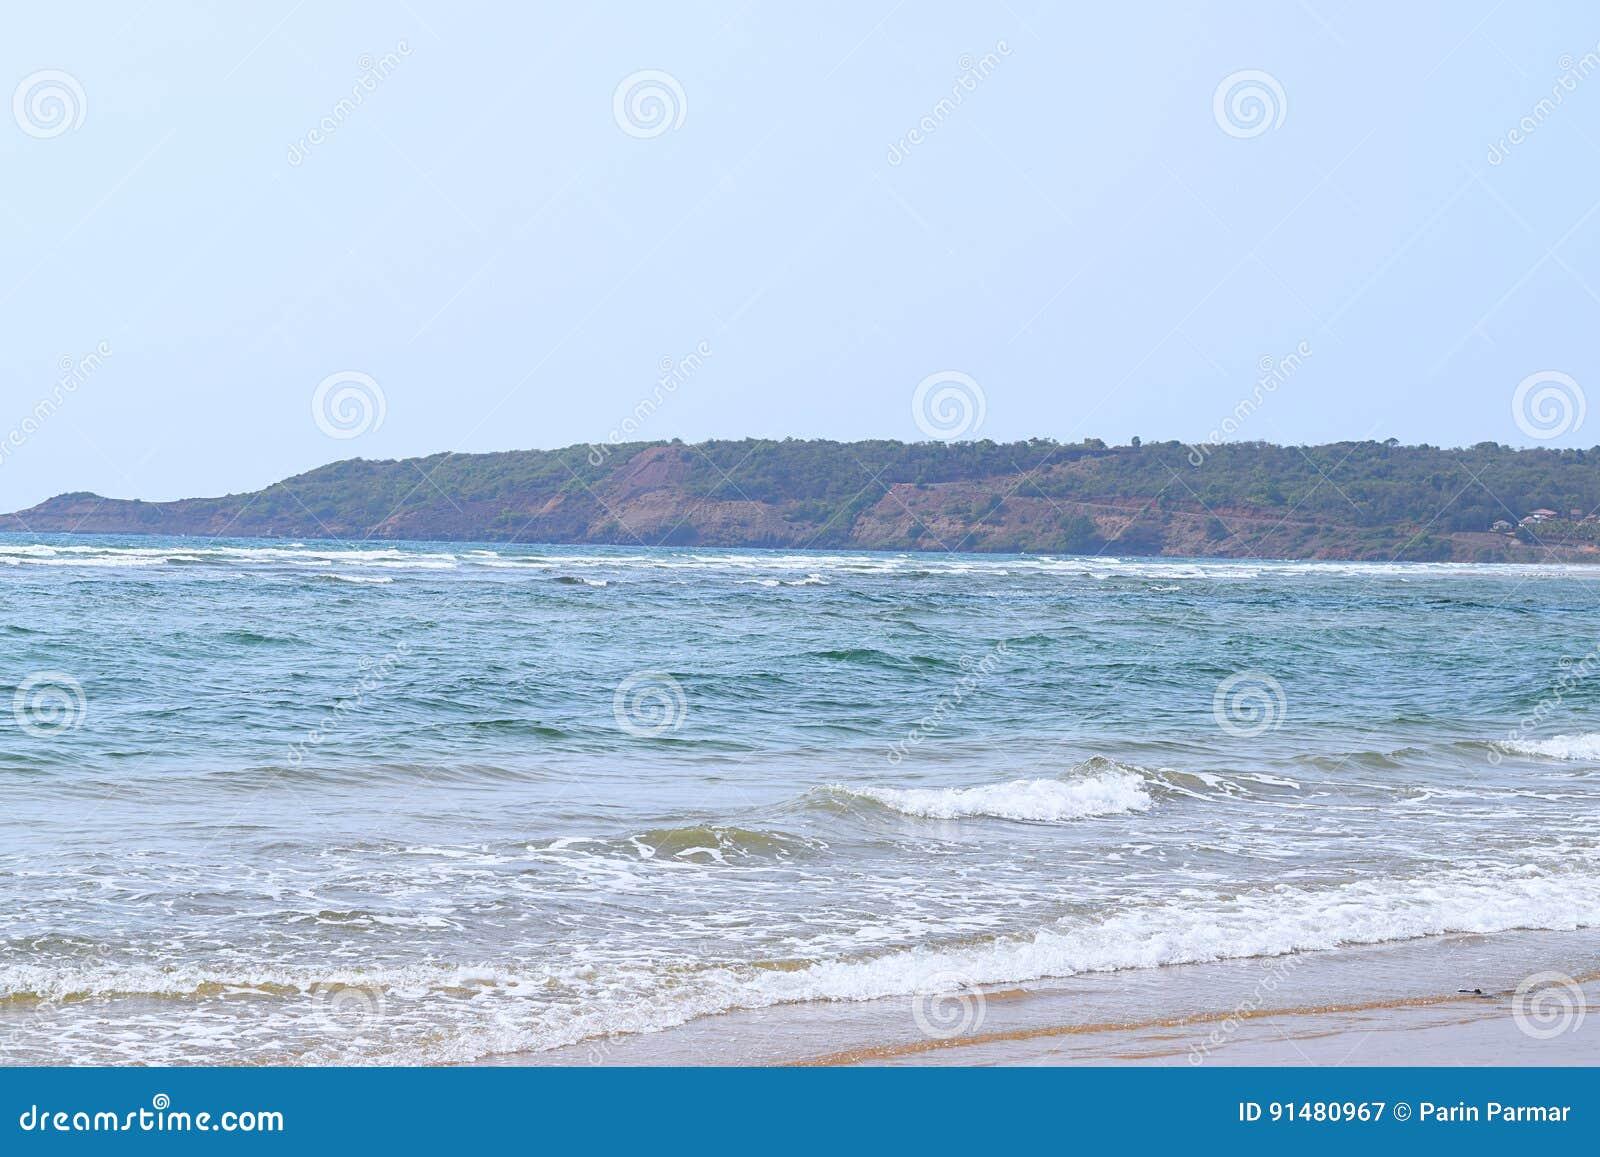 Artykuły plaża - Spokojna i Nieskazitelna plaża w Ganpatipule, Ratnagiri, maharashtra, India